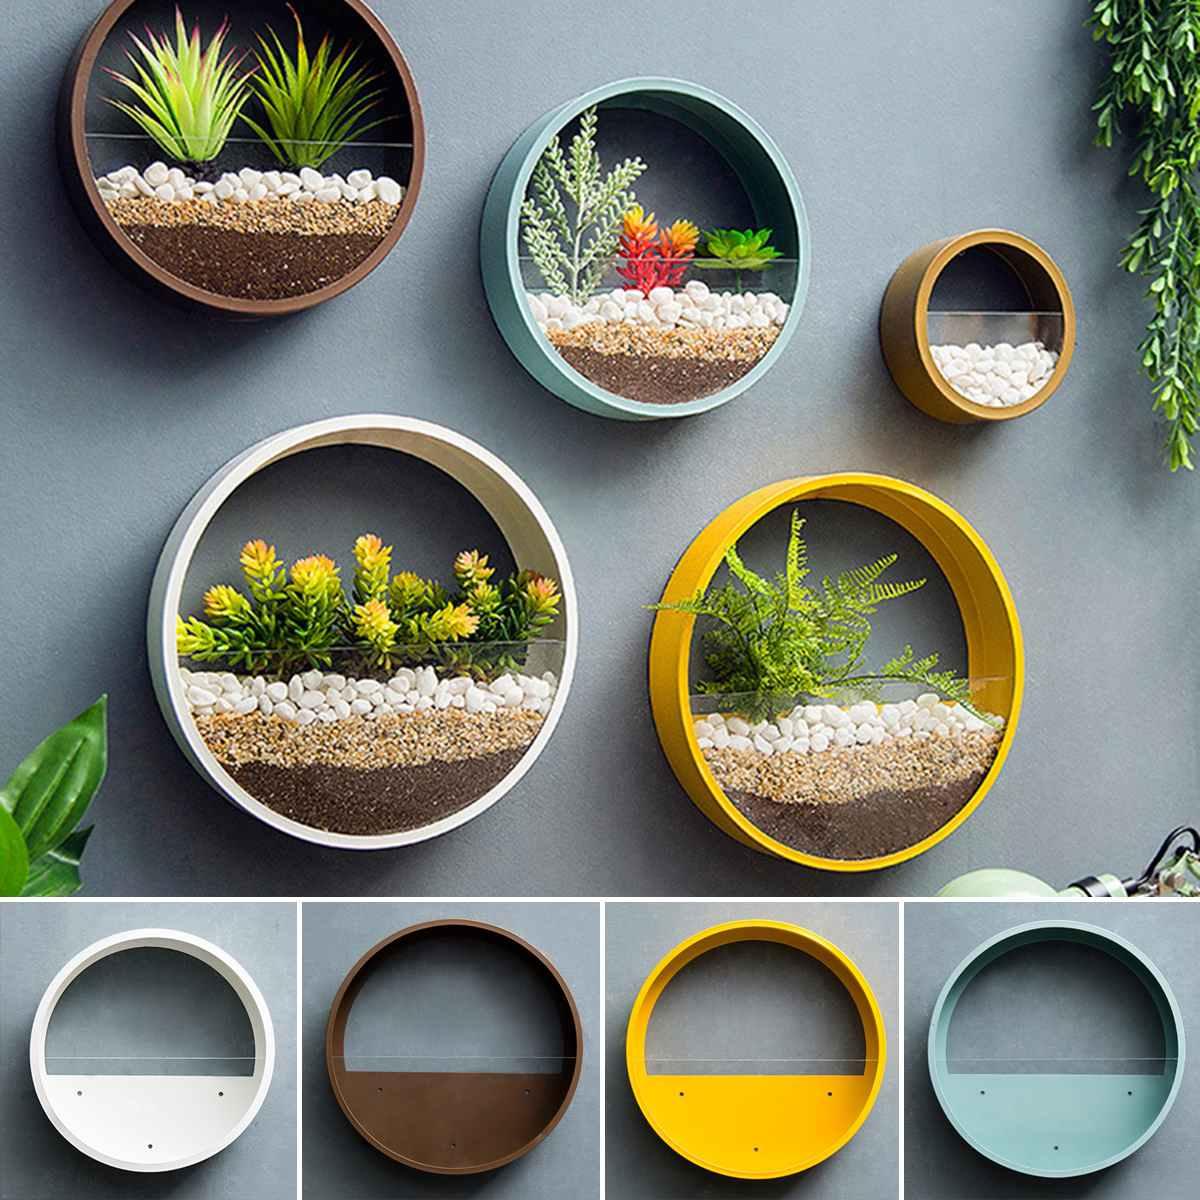 Modern Round Iron Wall Vase Home Living Room Restaurant Hanging Flower Pot Wall Decor Succulent Plant Planters Art Glass Vases